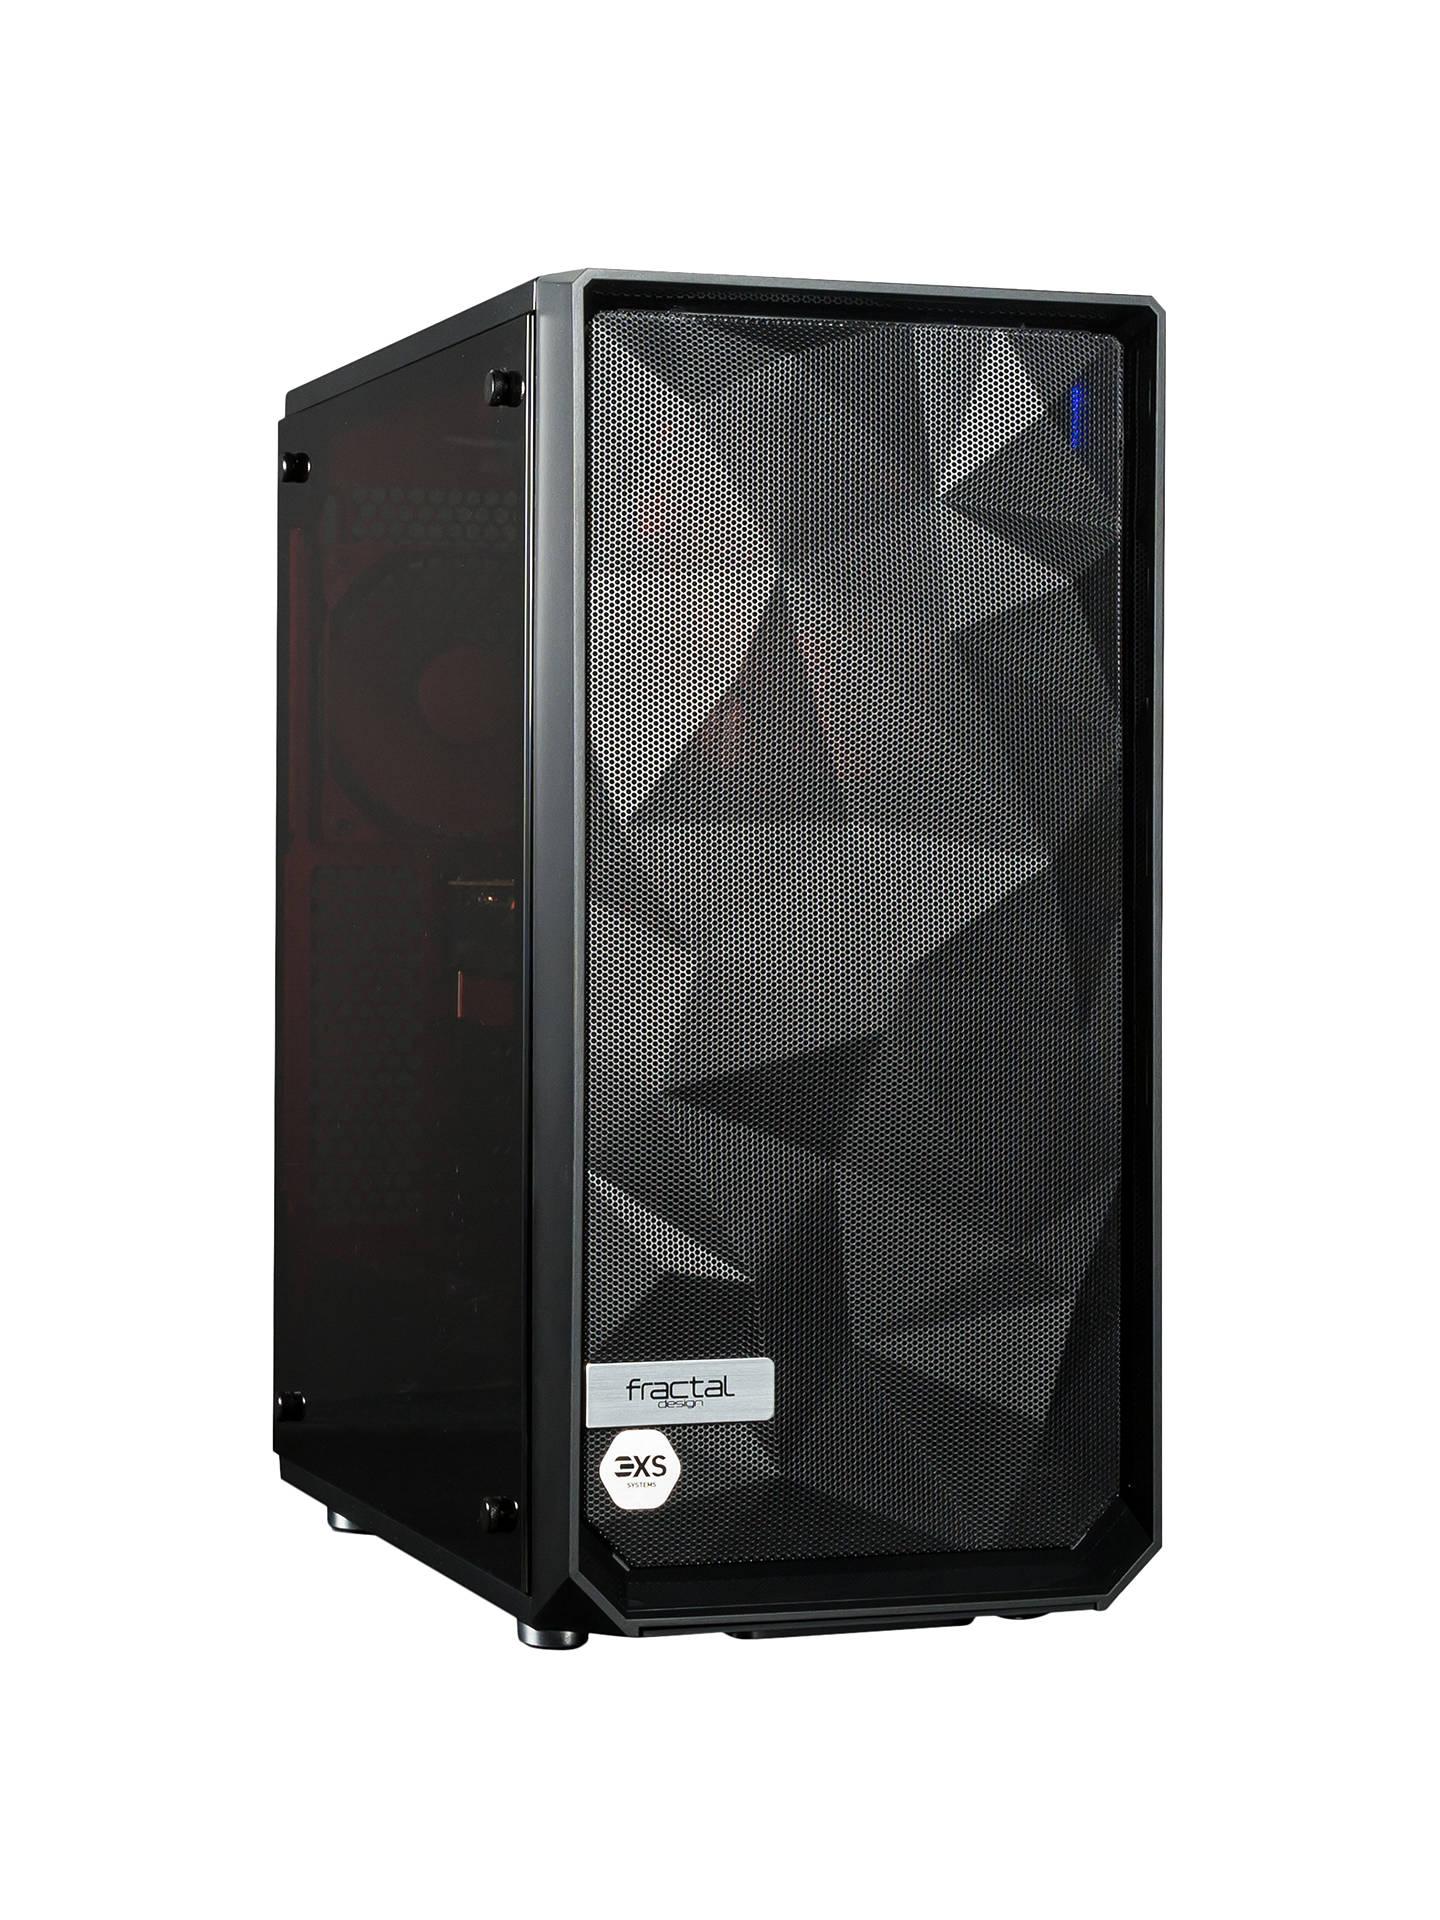 Scan 3XS LN85695 Gaming PC, Intel Core i7, 16GB RAM, 2TB HDD